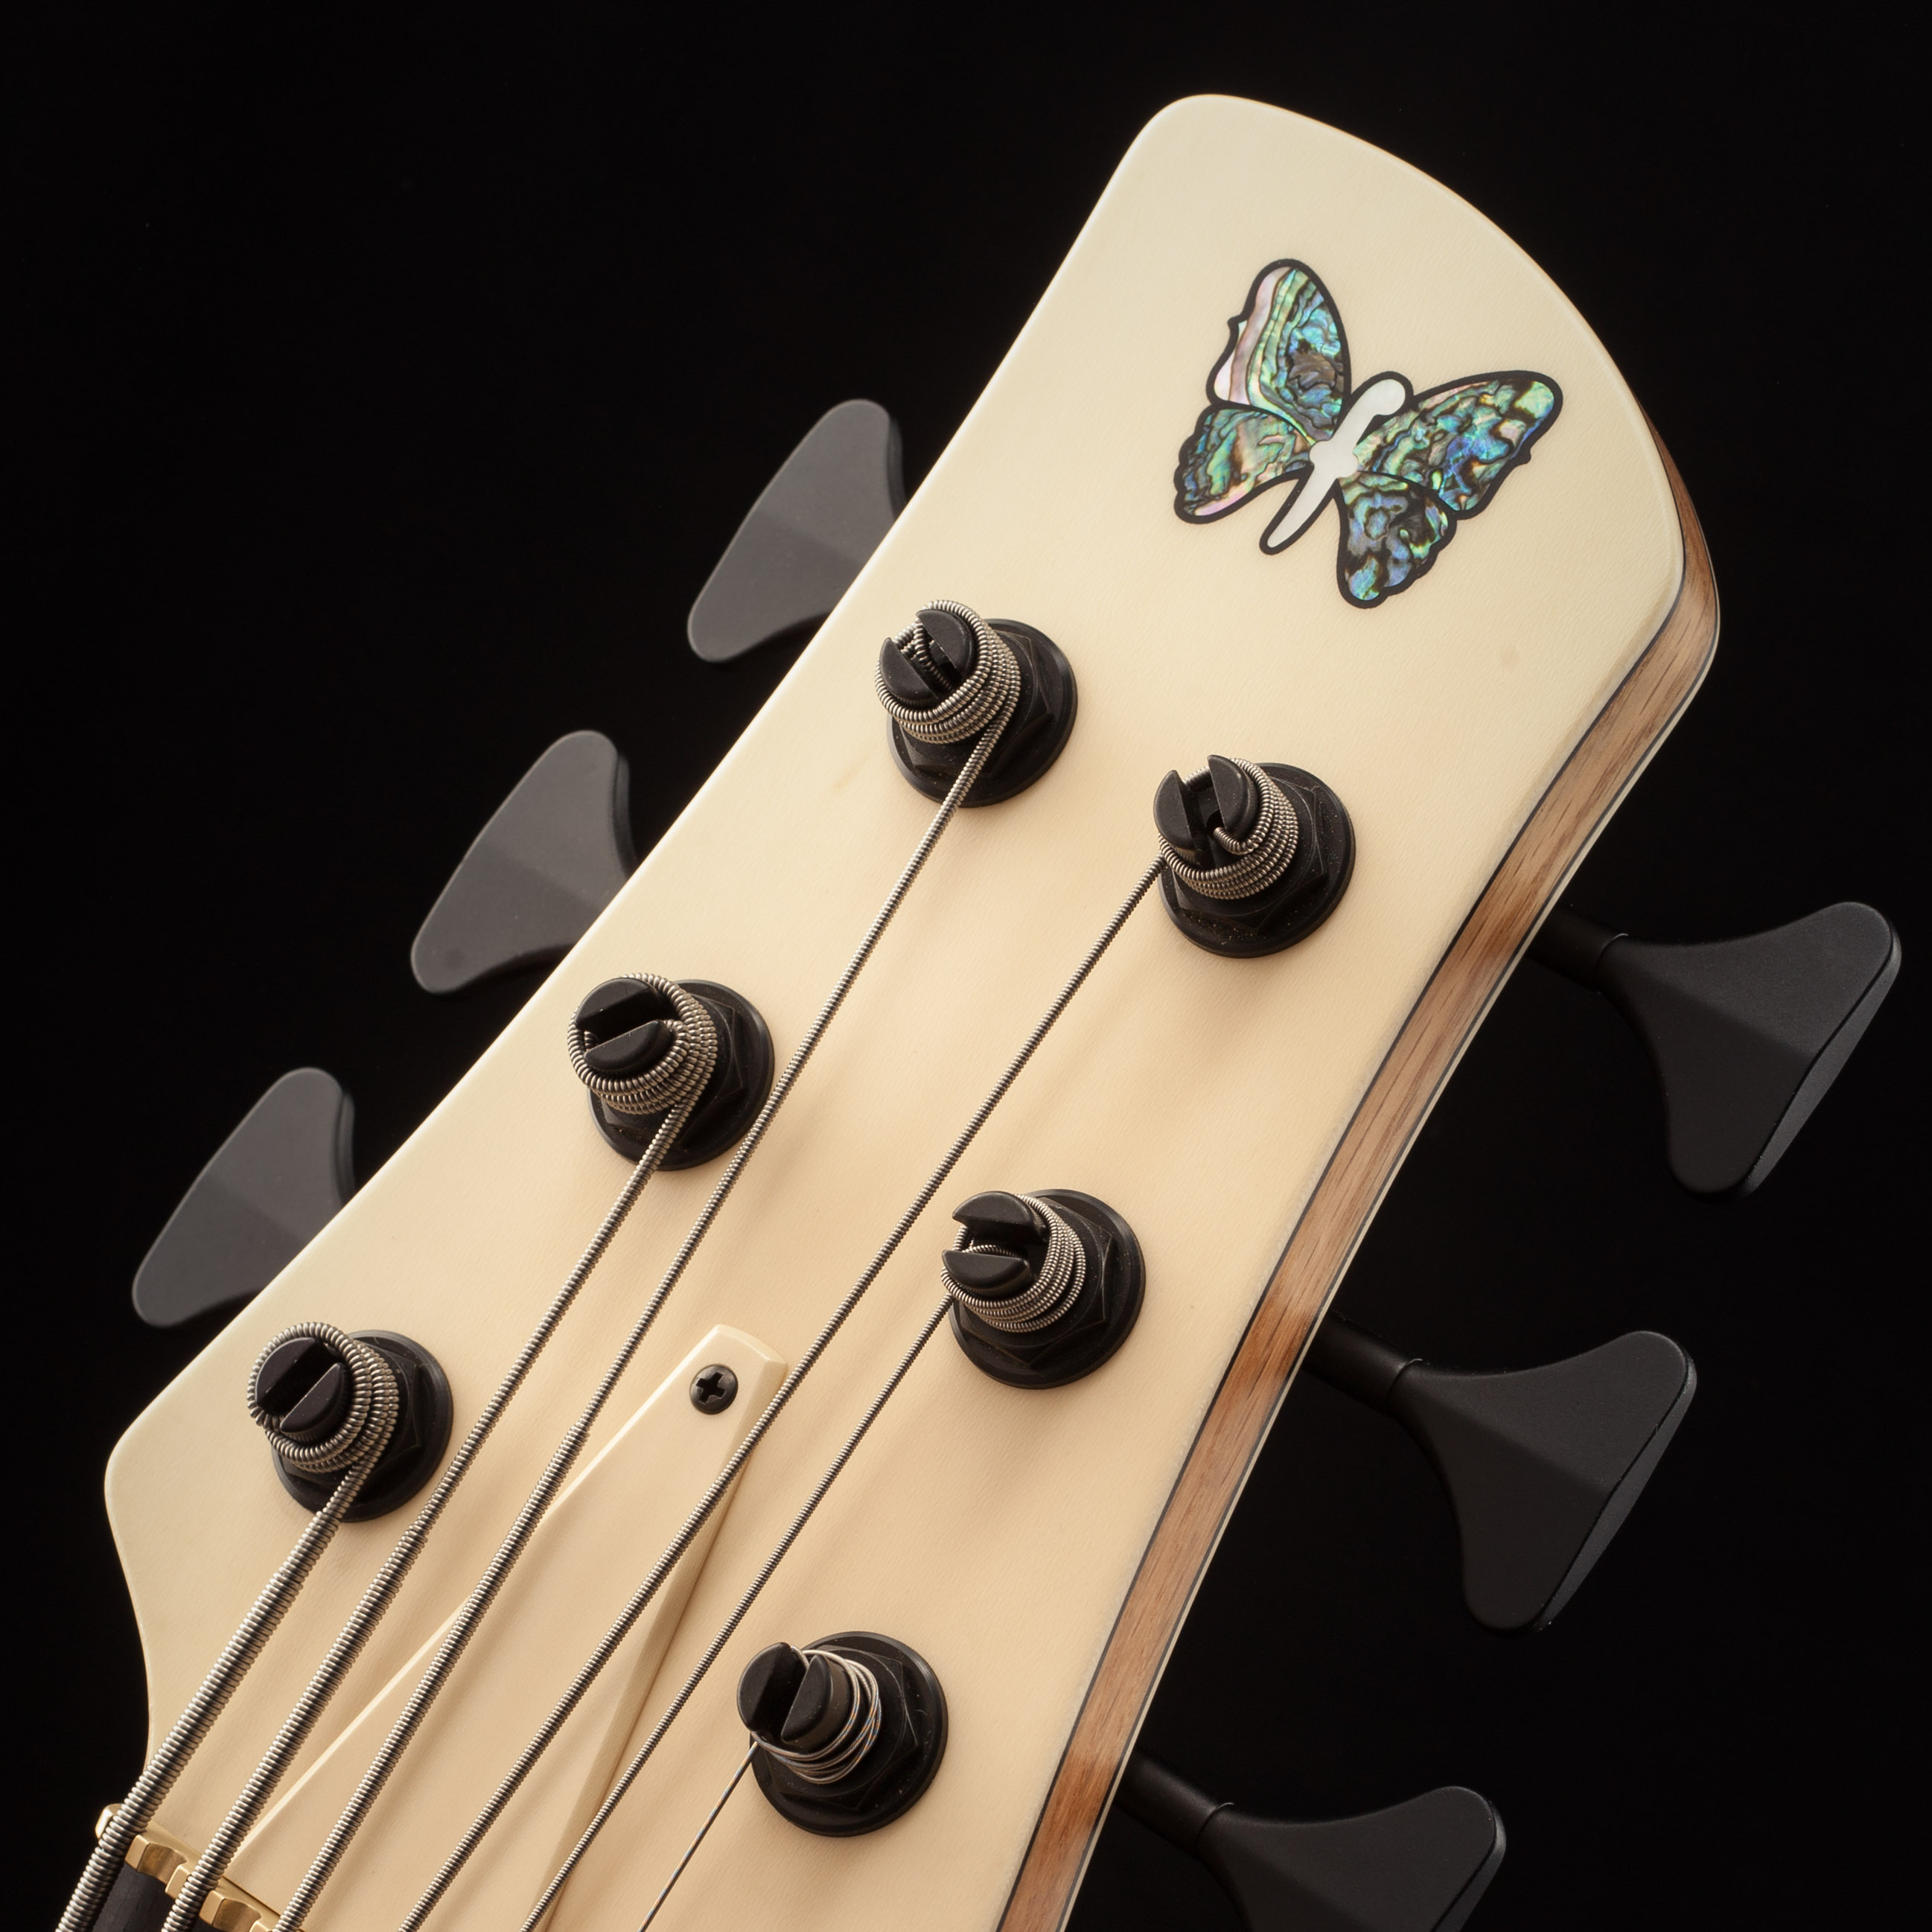 Fodera Custom Guitar Headstock Closeup